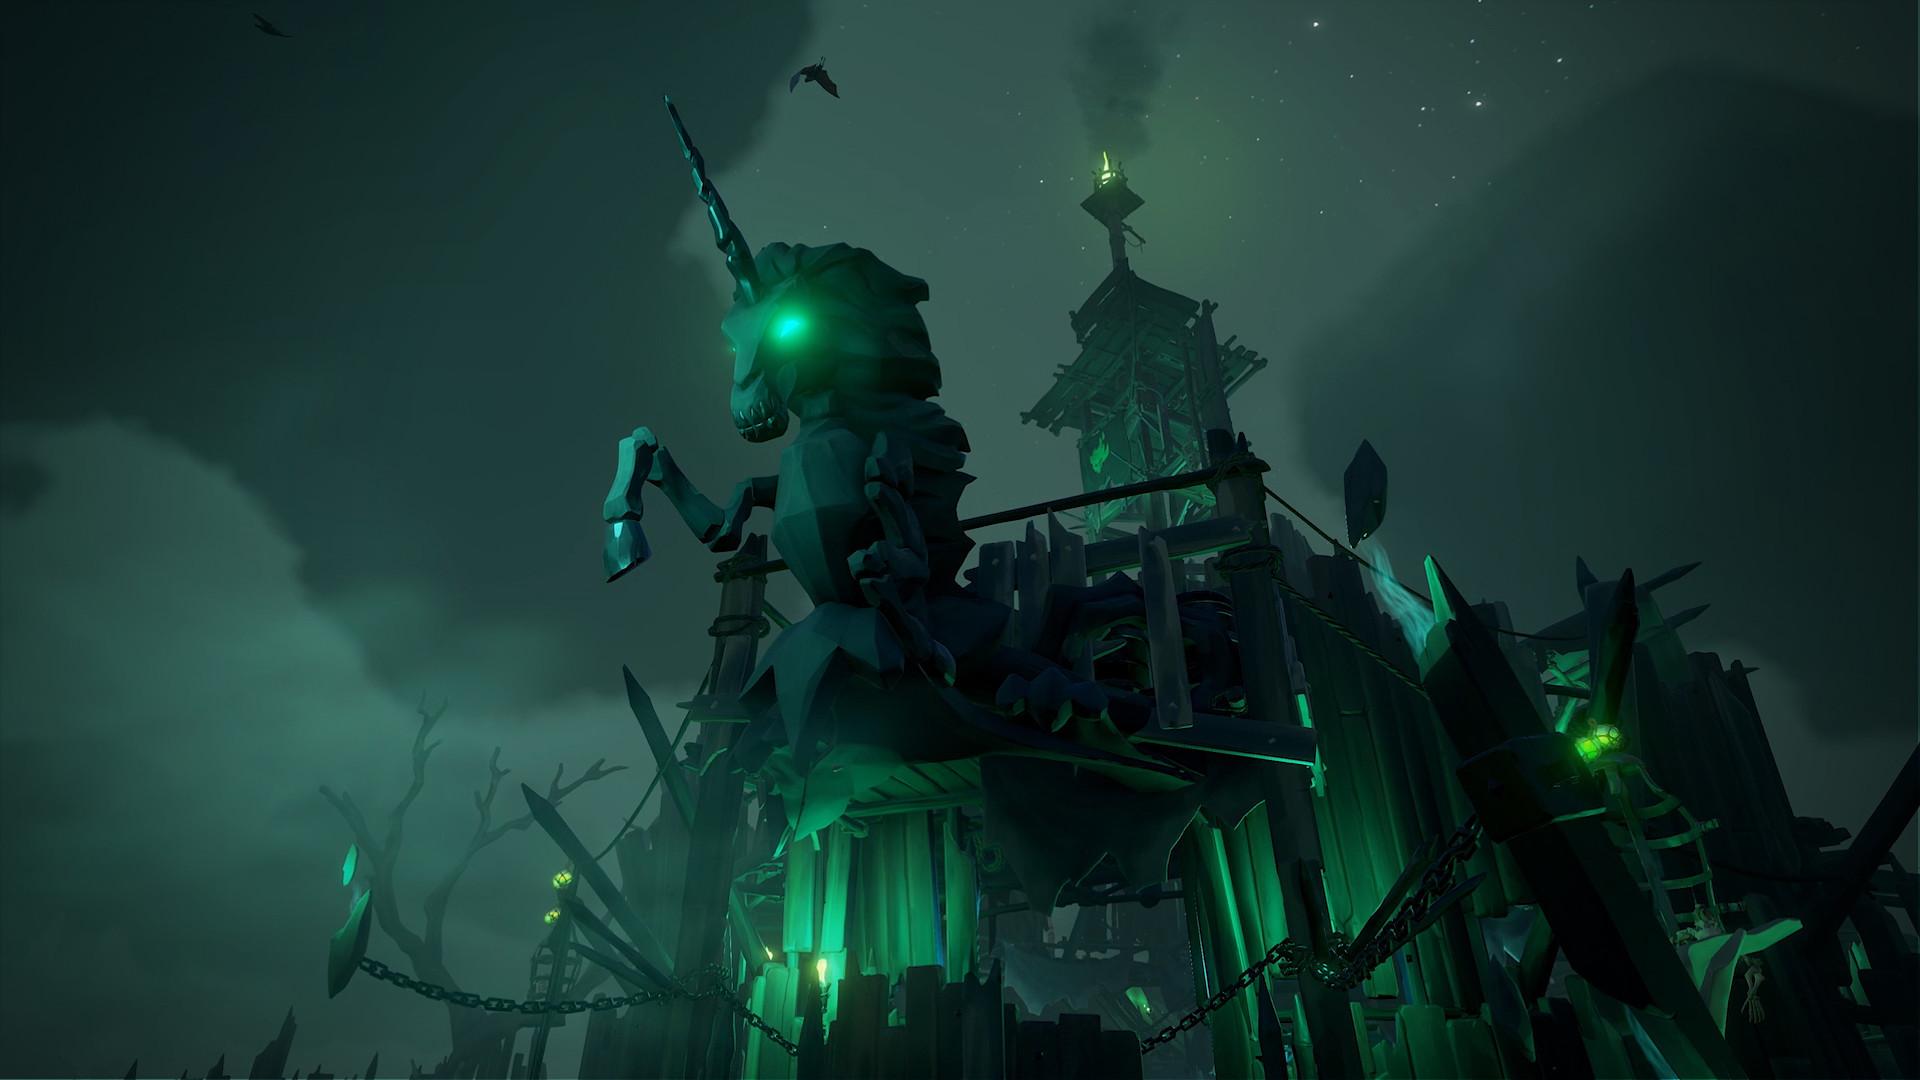 sea of thieves 5 - دانلود بازی آنلاین Sea of Thieves برای کامپیوتر